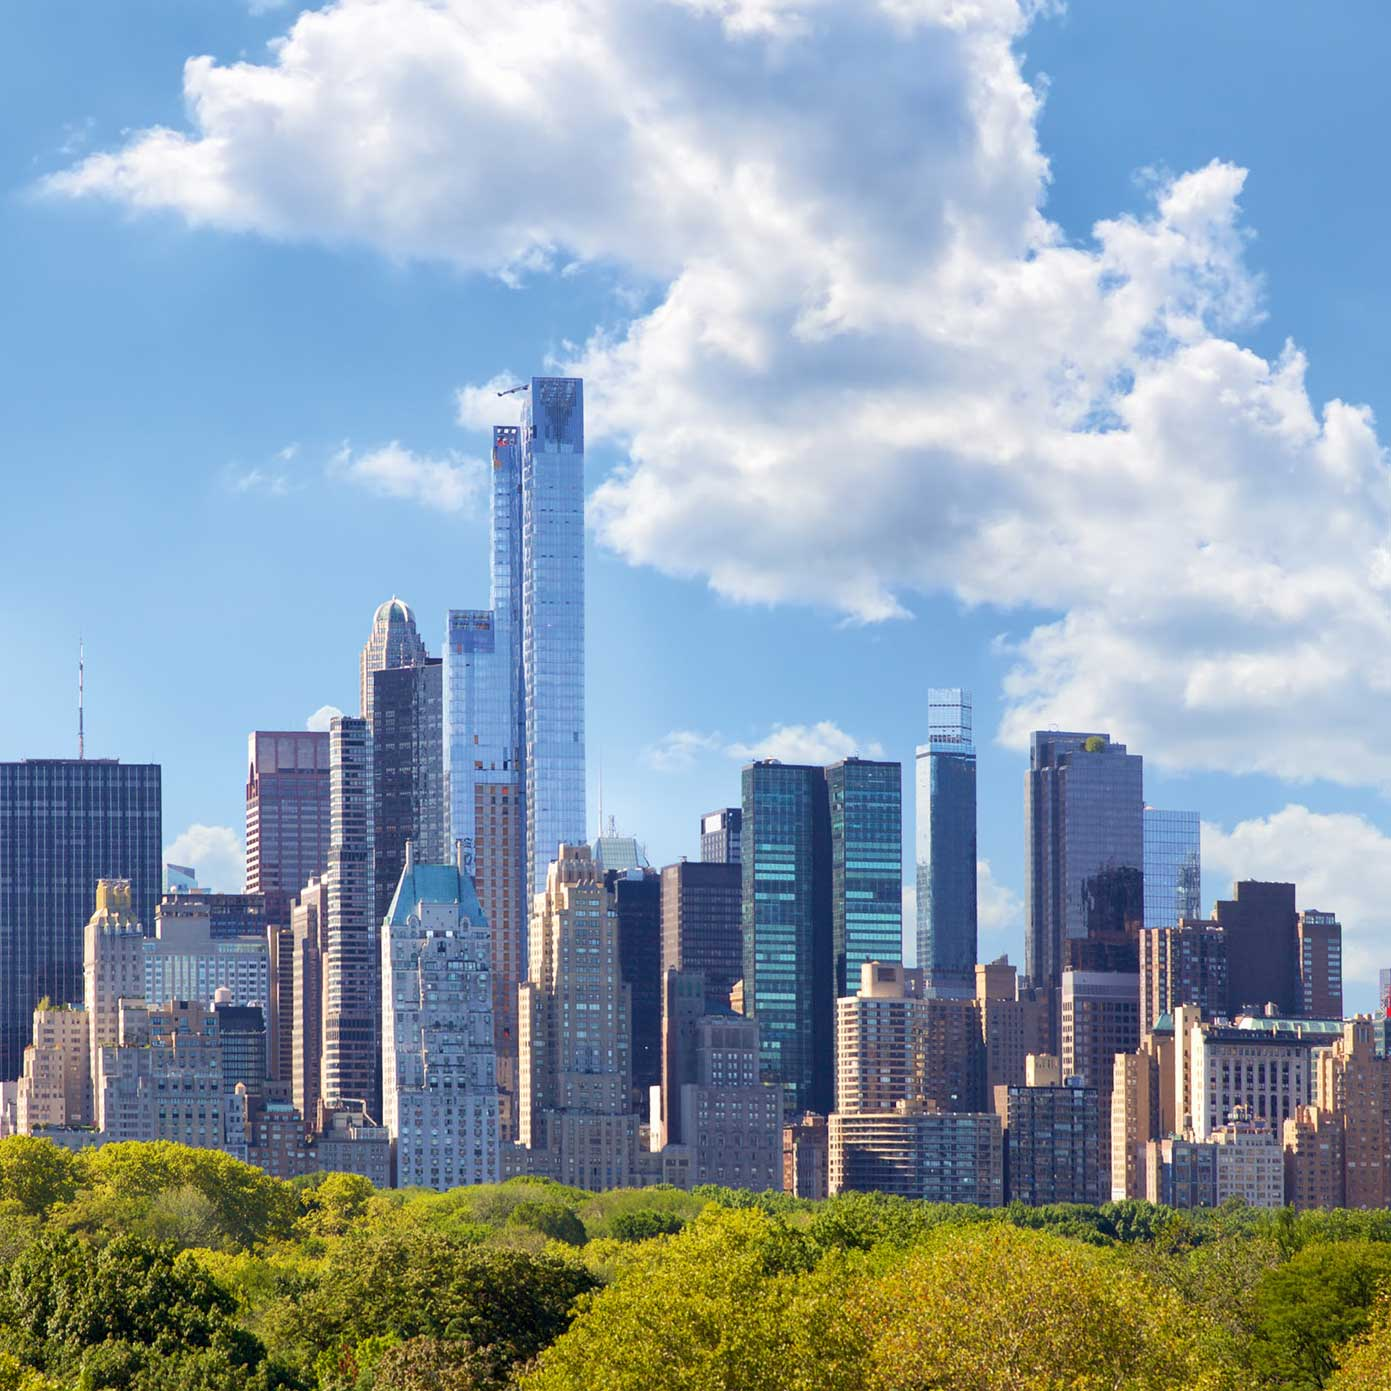 Modellbahn Hintergrund Metropolis NY-Skyline auf 3 x 0,5m 1